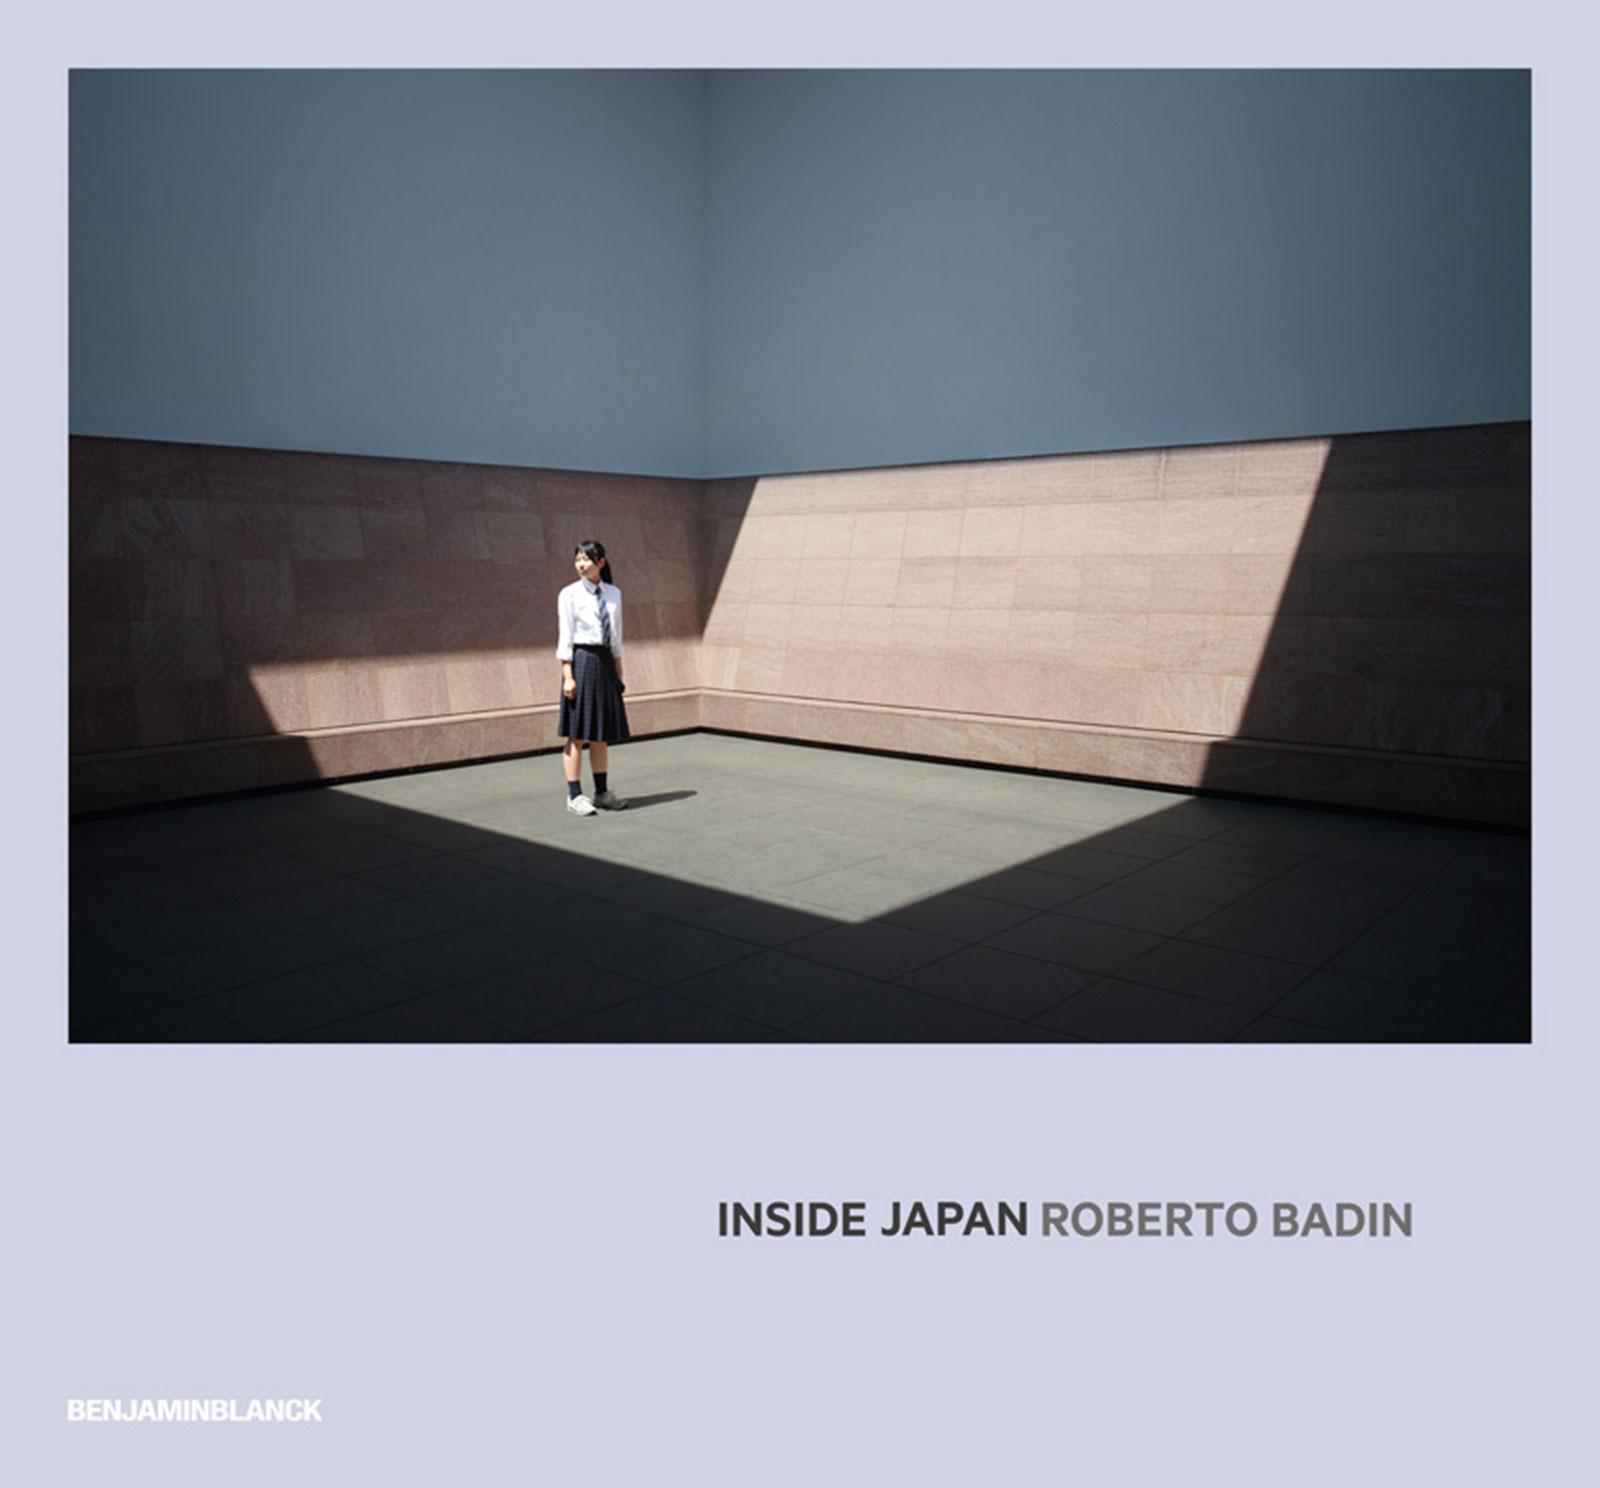 InsideJapan_RobertoBadin.jpg